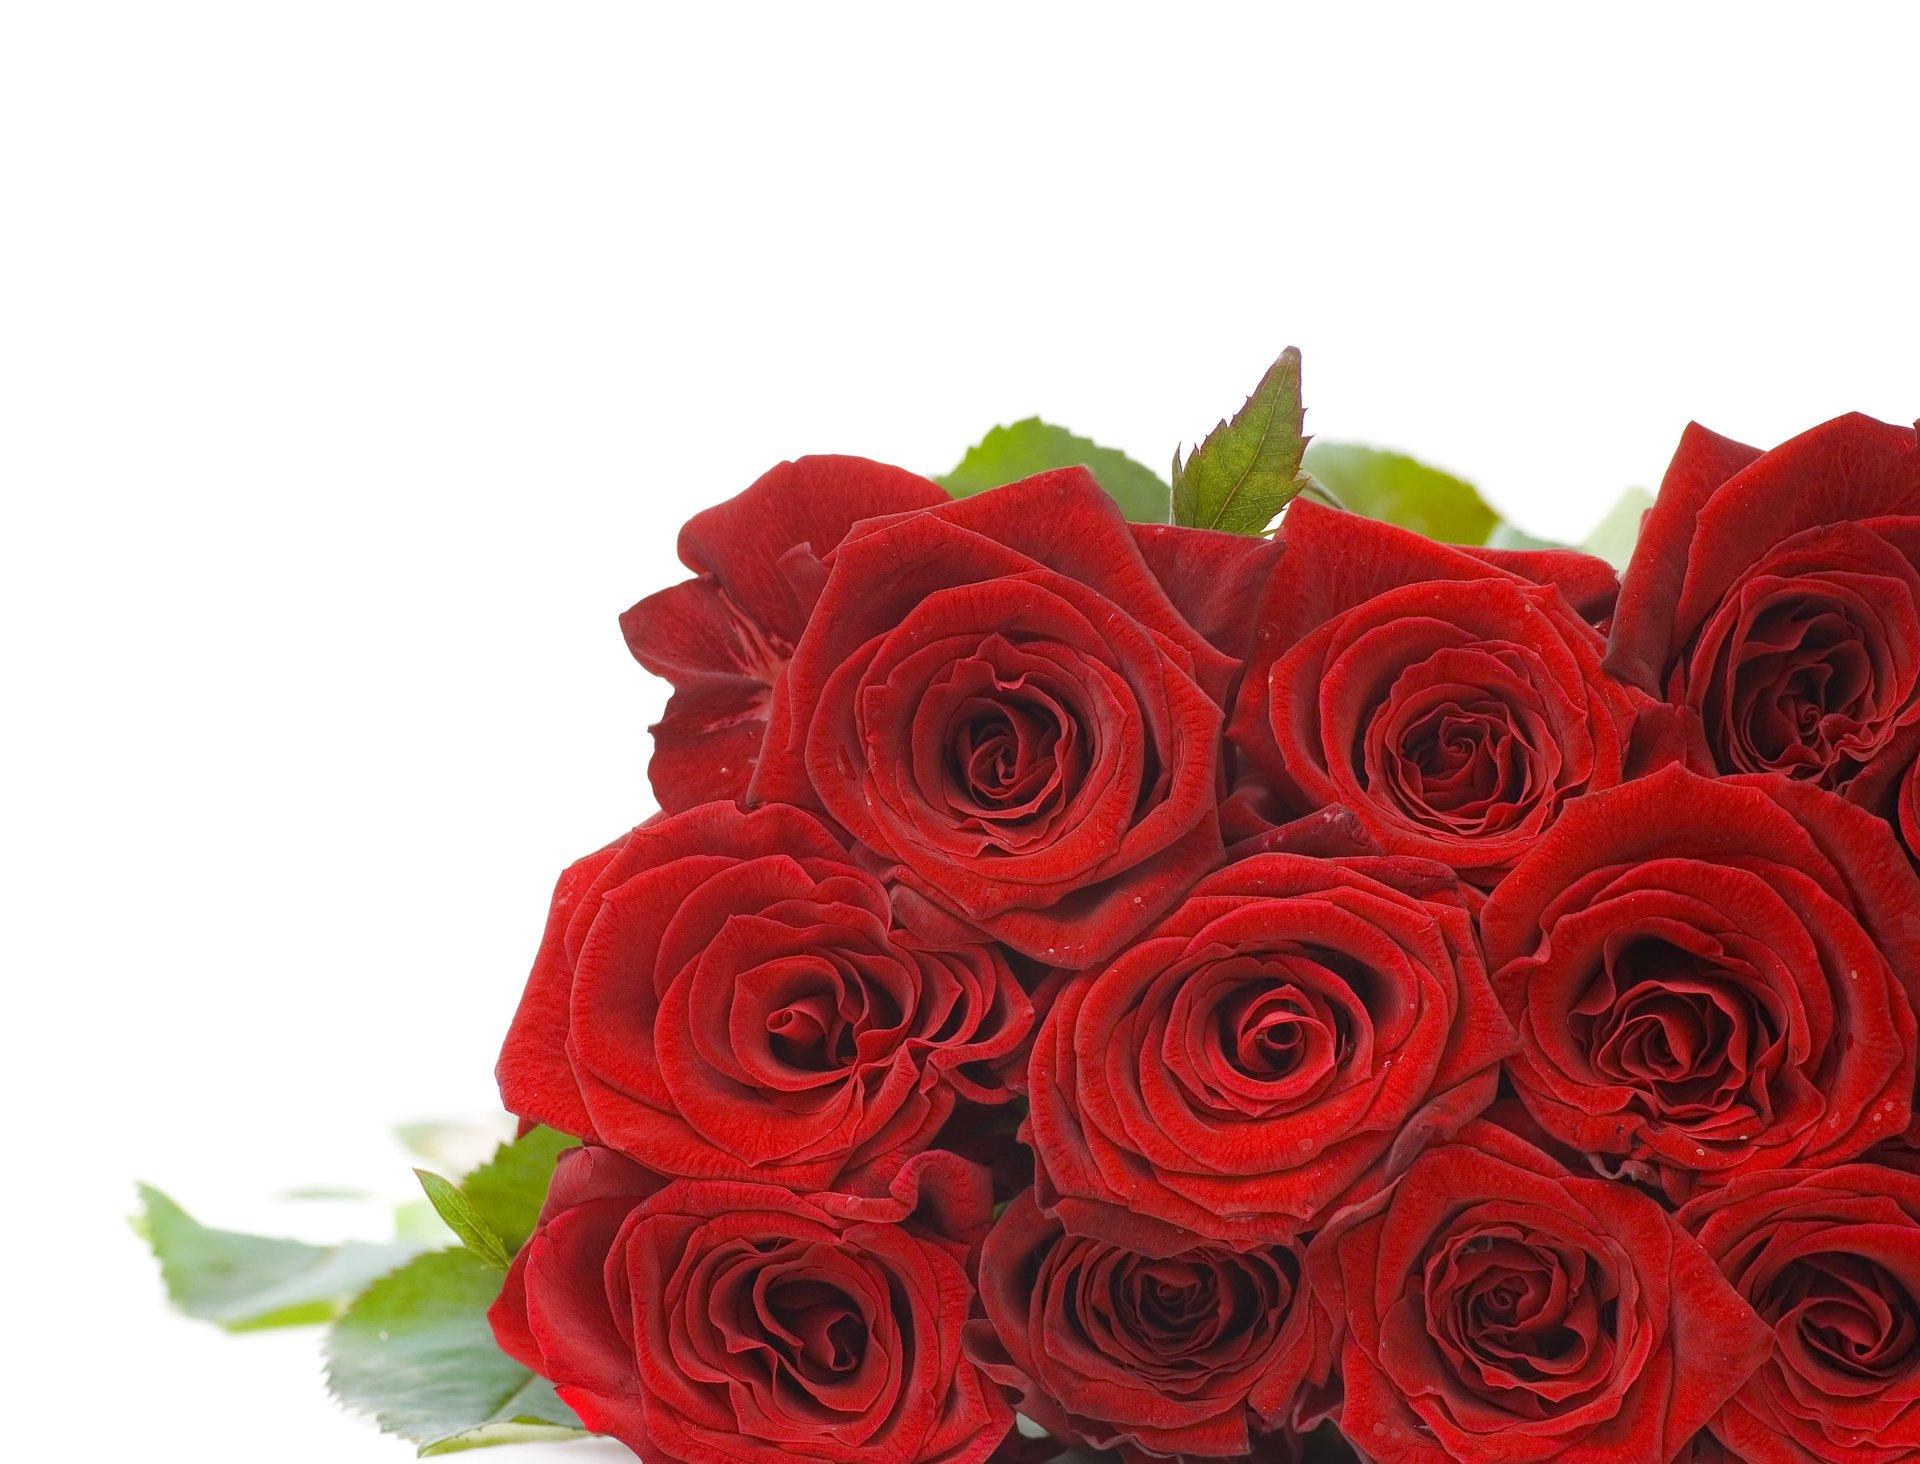 Картинки, открытка с розами на белом фоне